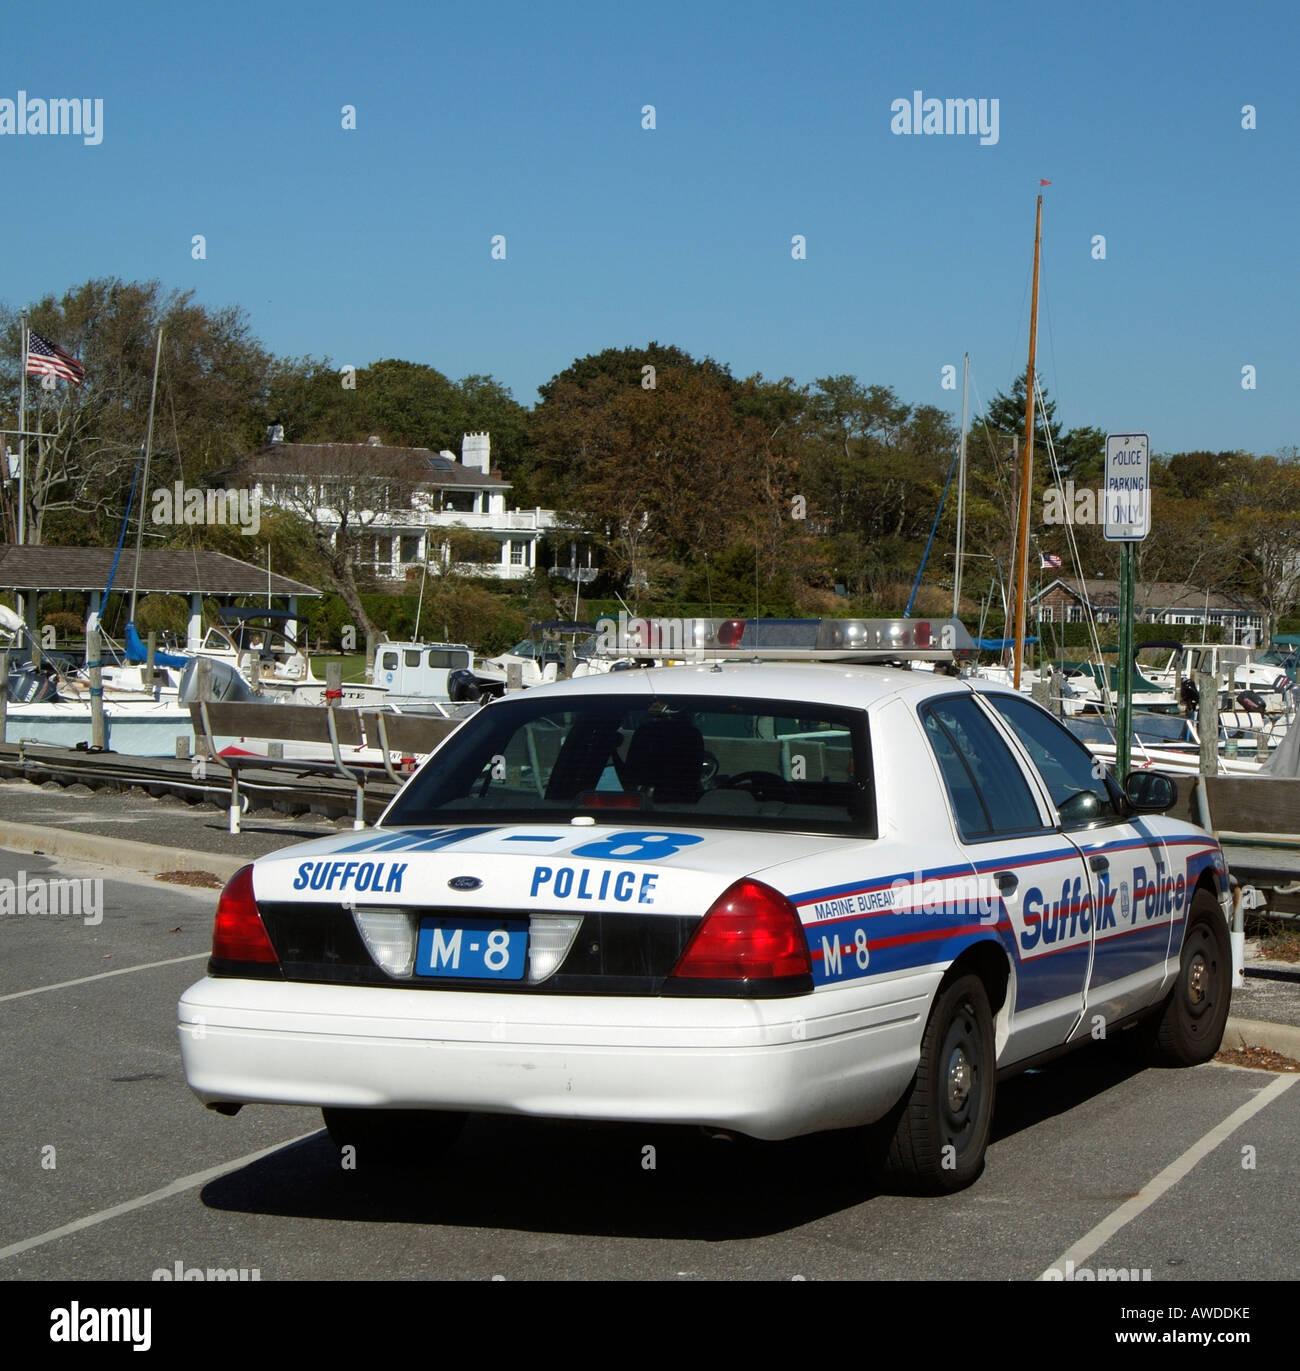 suffolk county marine bureau police car on bellport marina. Black Bedroom Furniture Sets. Home Design Ideas